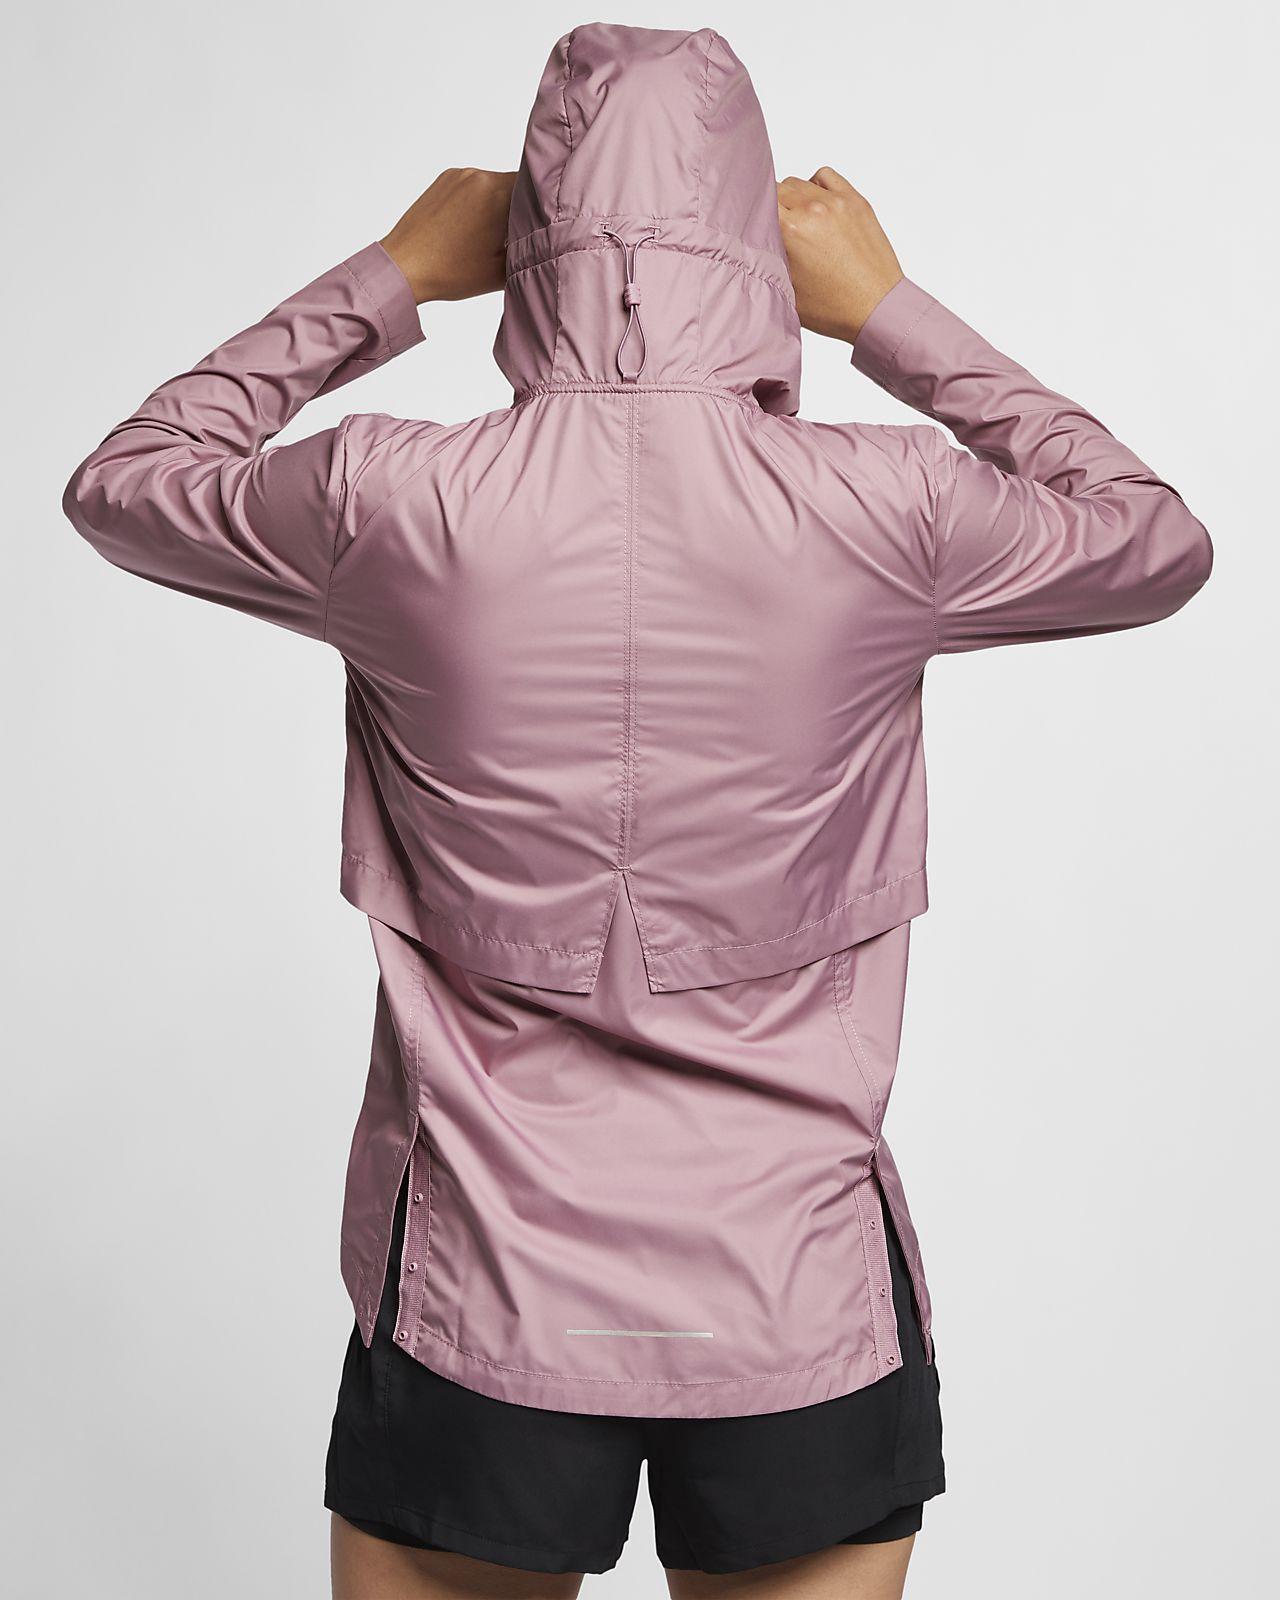 De Running Veste Essential Nike Pour Femme Ma a6xdqOwR